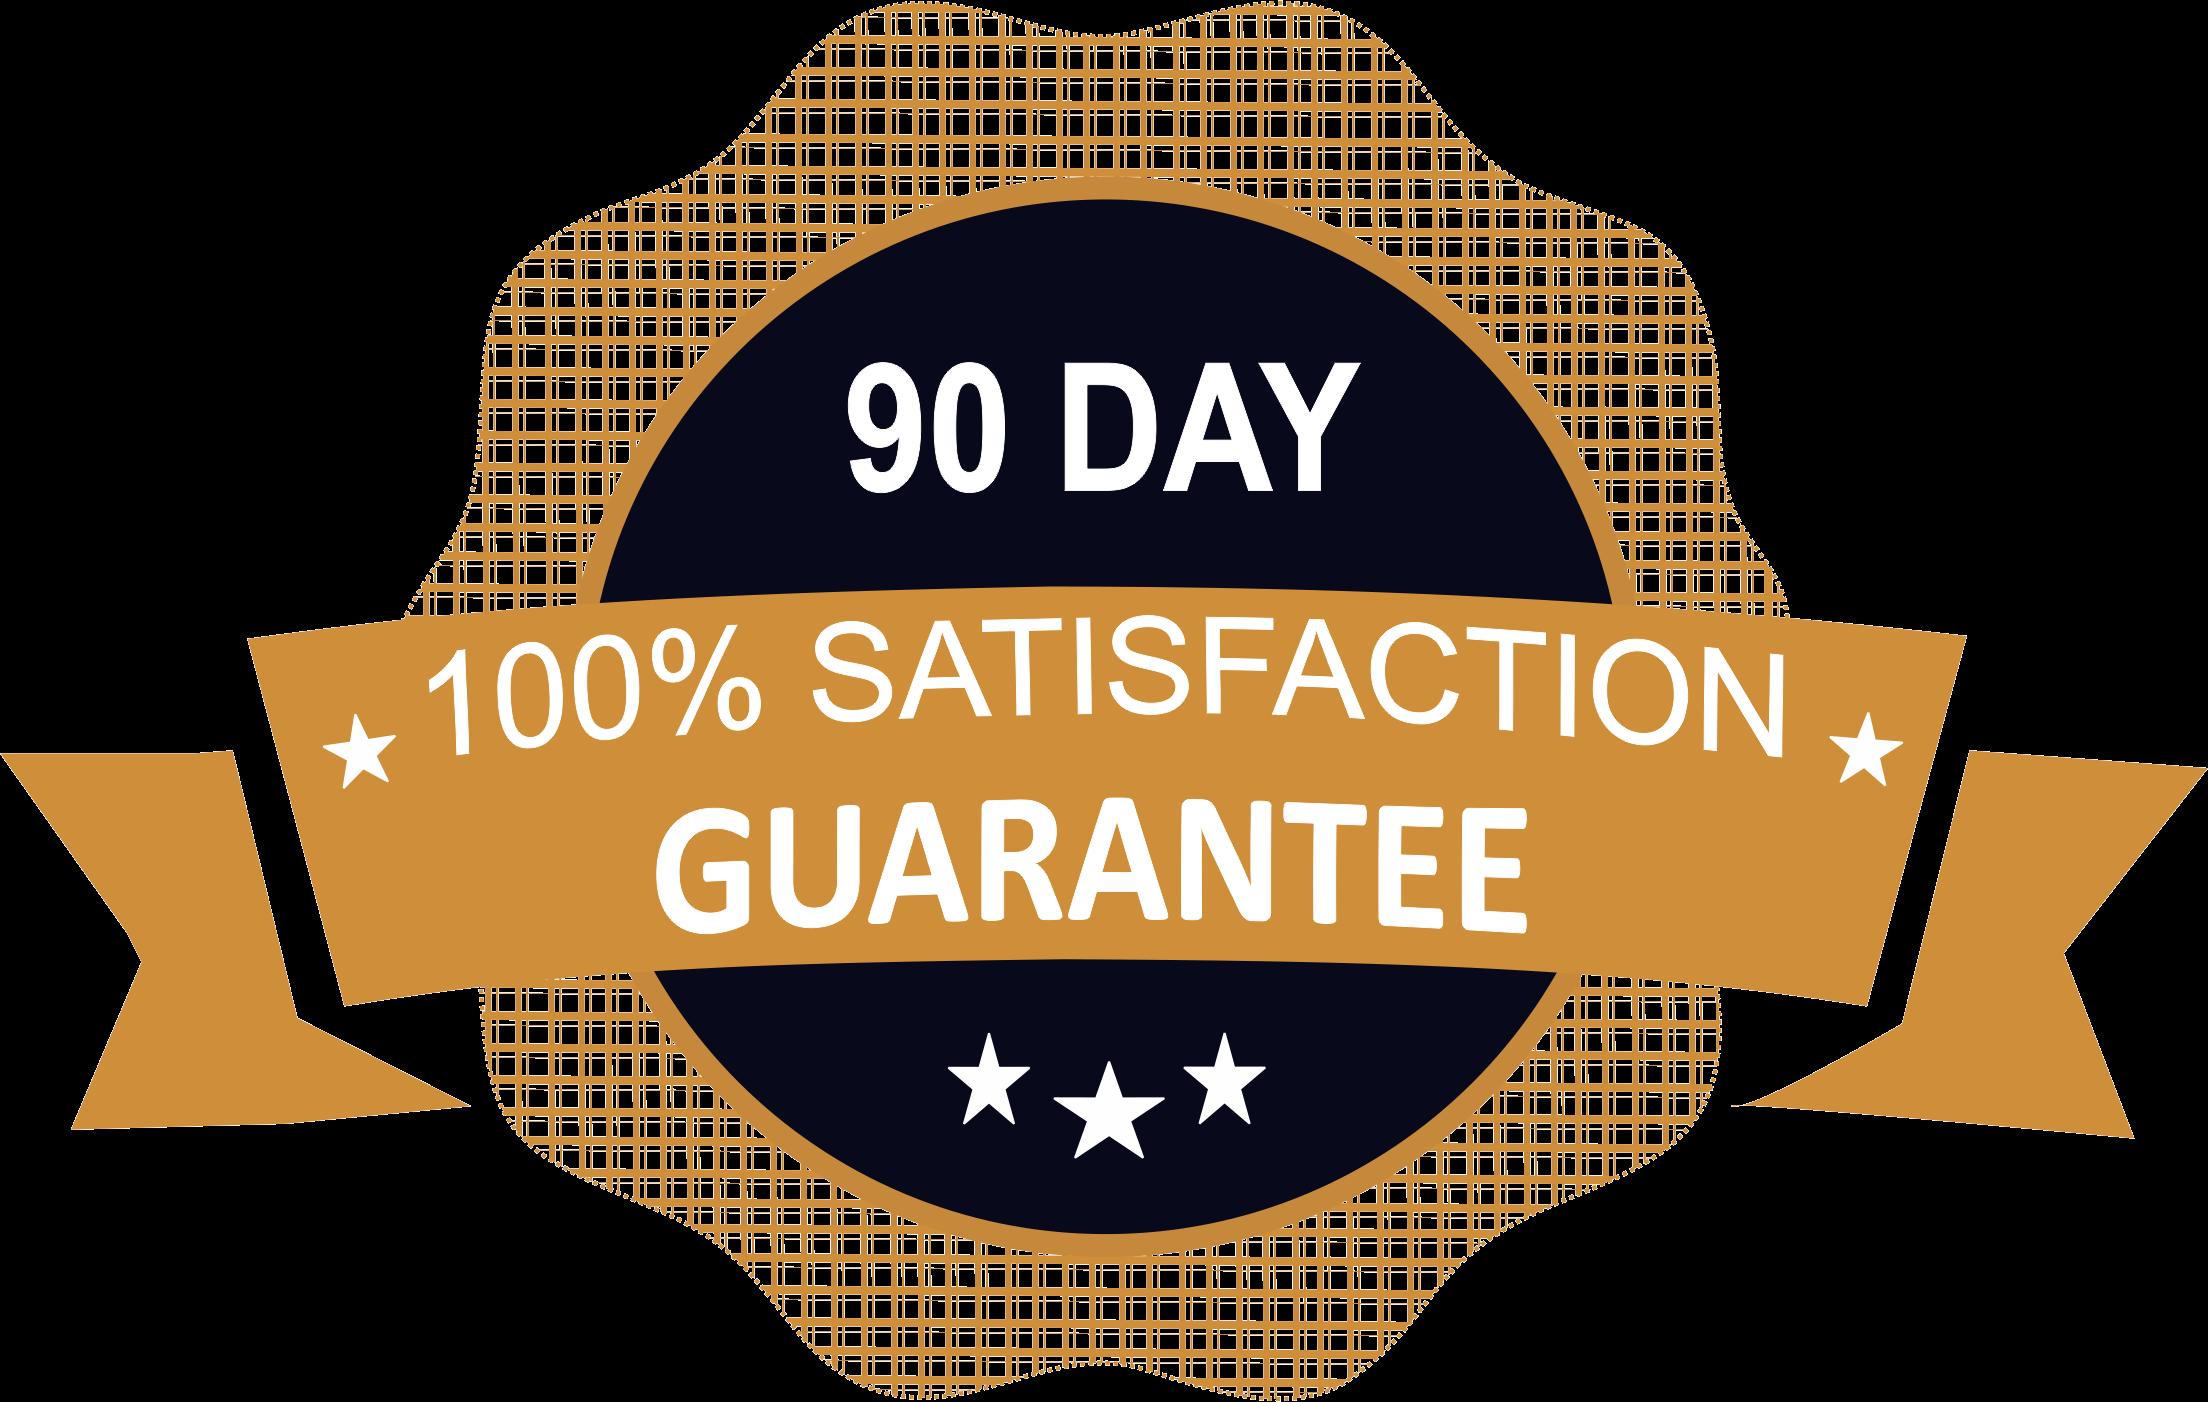 90 day 100% satisfaction guarantee